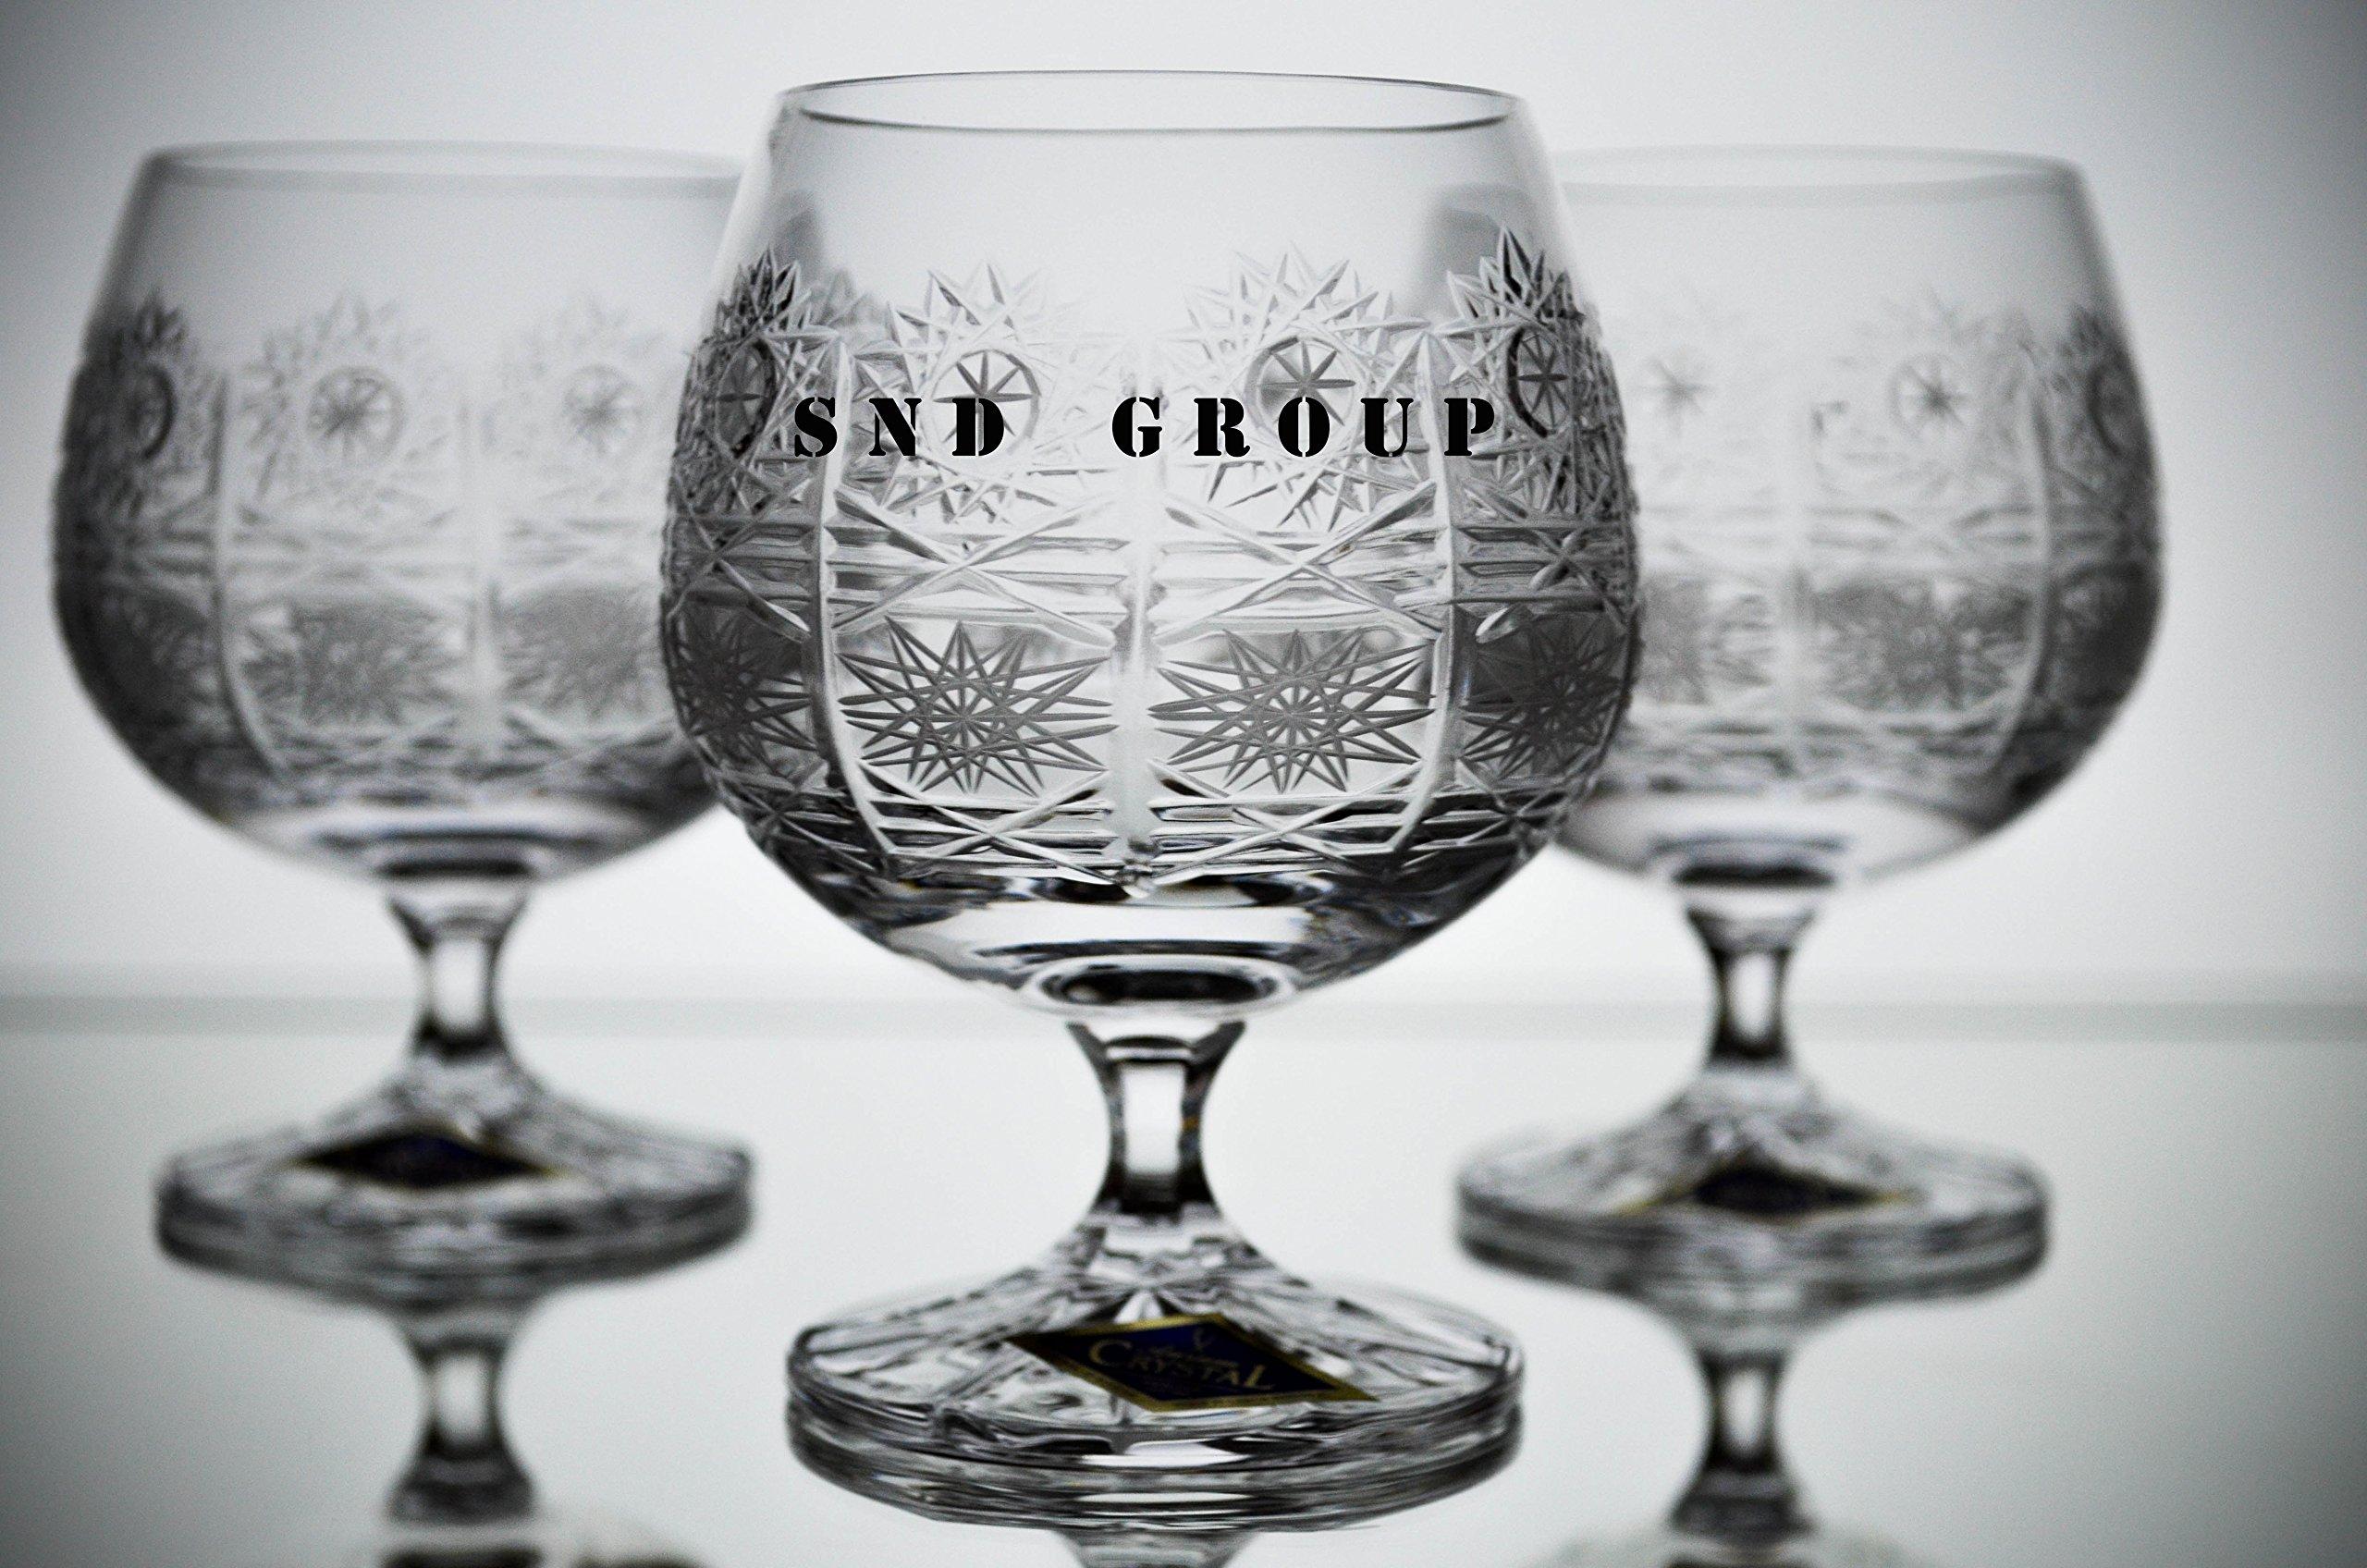 BOHEMIAN CRYSTAL GLASS SNIFTER GLASSES 8oz SET OF 6 COGNAC BRANDY ARMAGNAC CALVADOS WHISKEY STEM GOBLETS HAND CUT CRYSTAL GLASS VINTAGE EUROPEAN DESIGN CLASSIC CZECH CRYSTAL GLASS